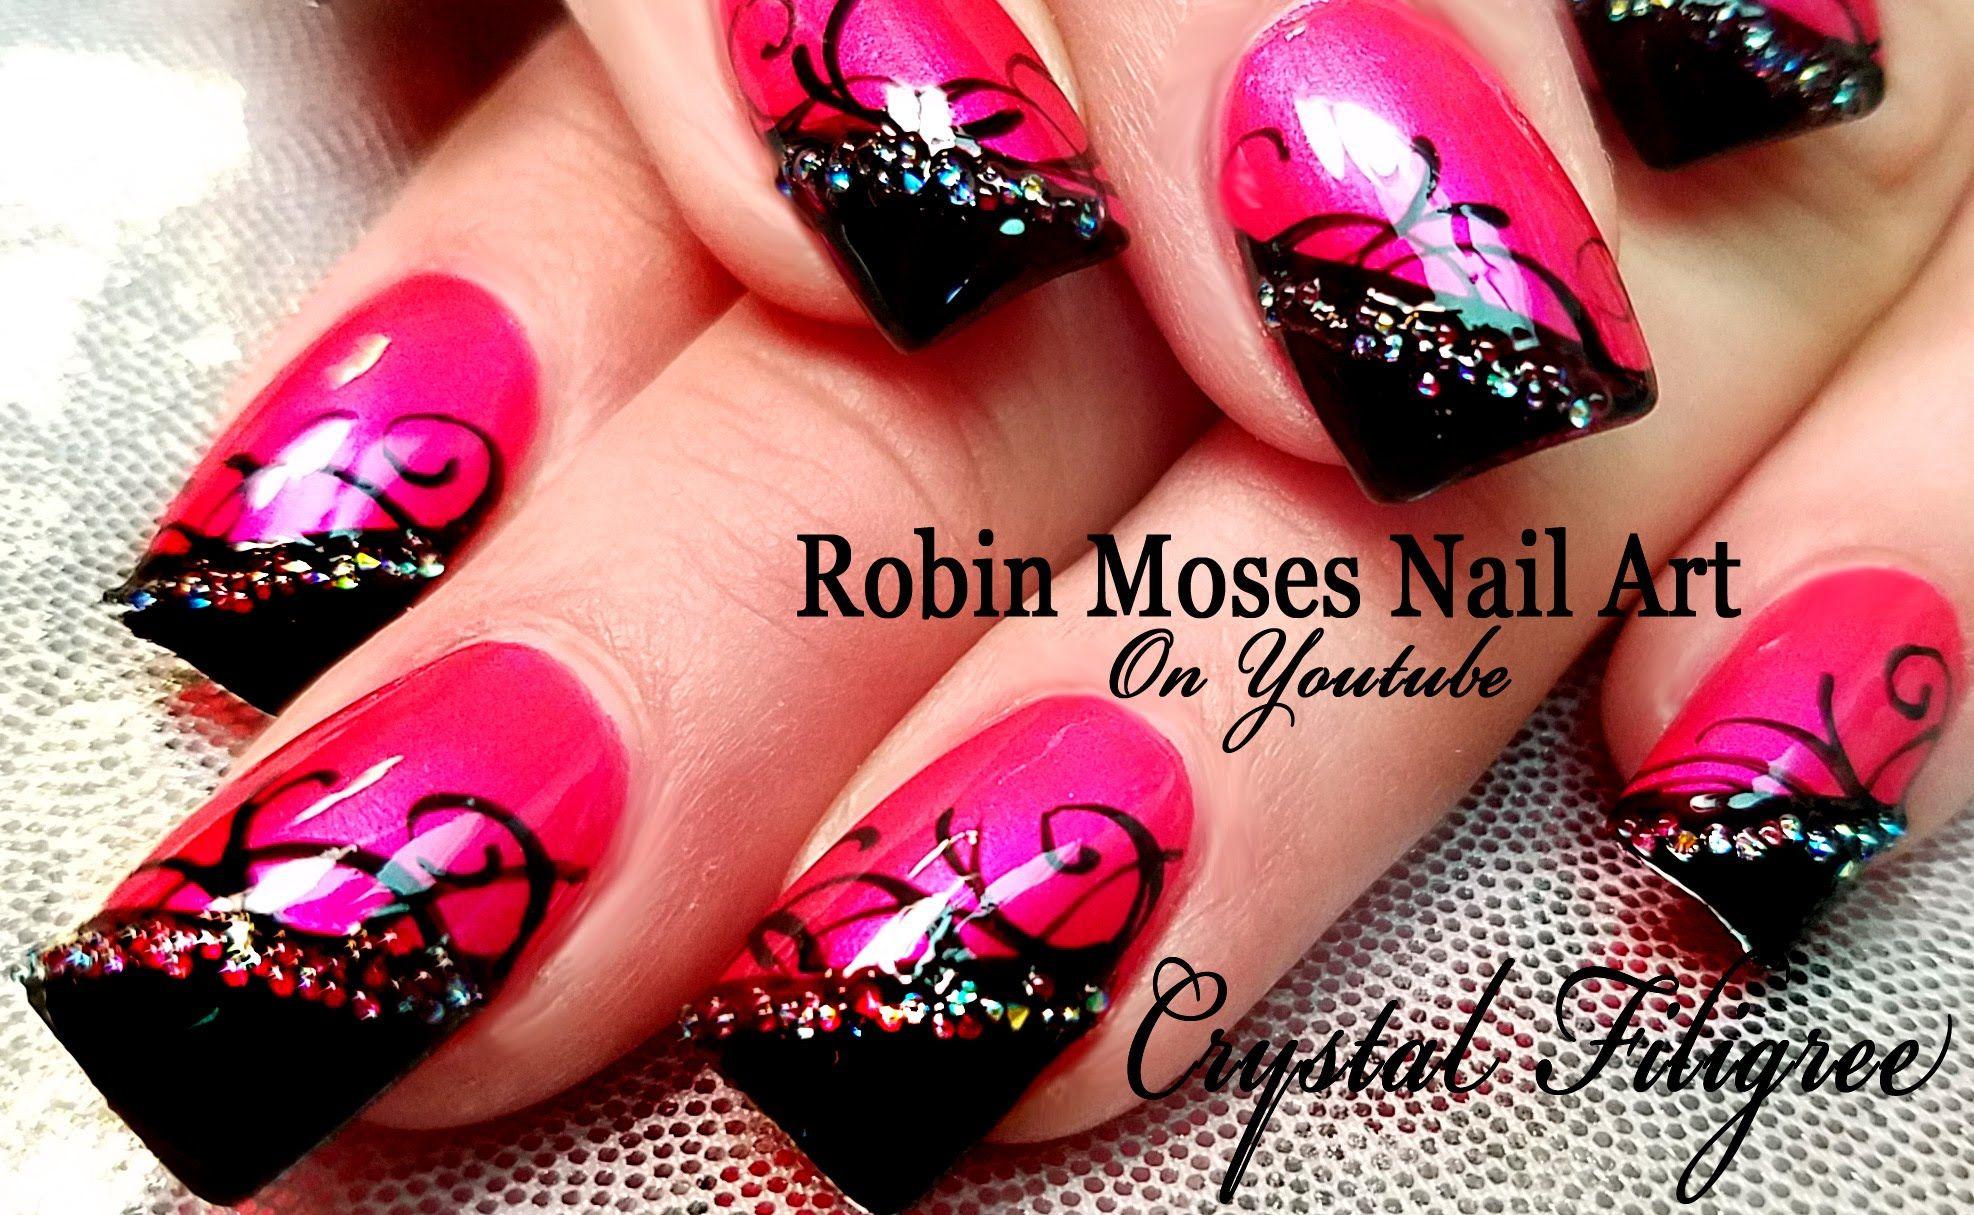 diy easy hot pink nail art design summer nails with